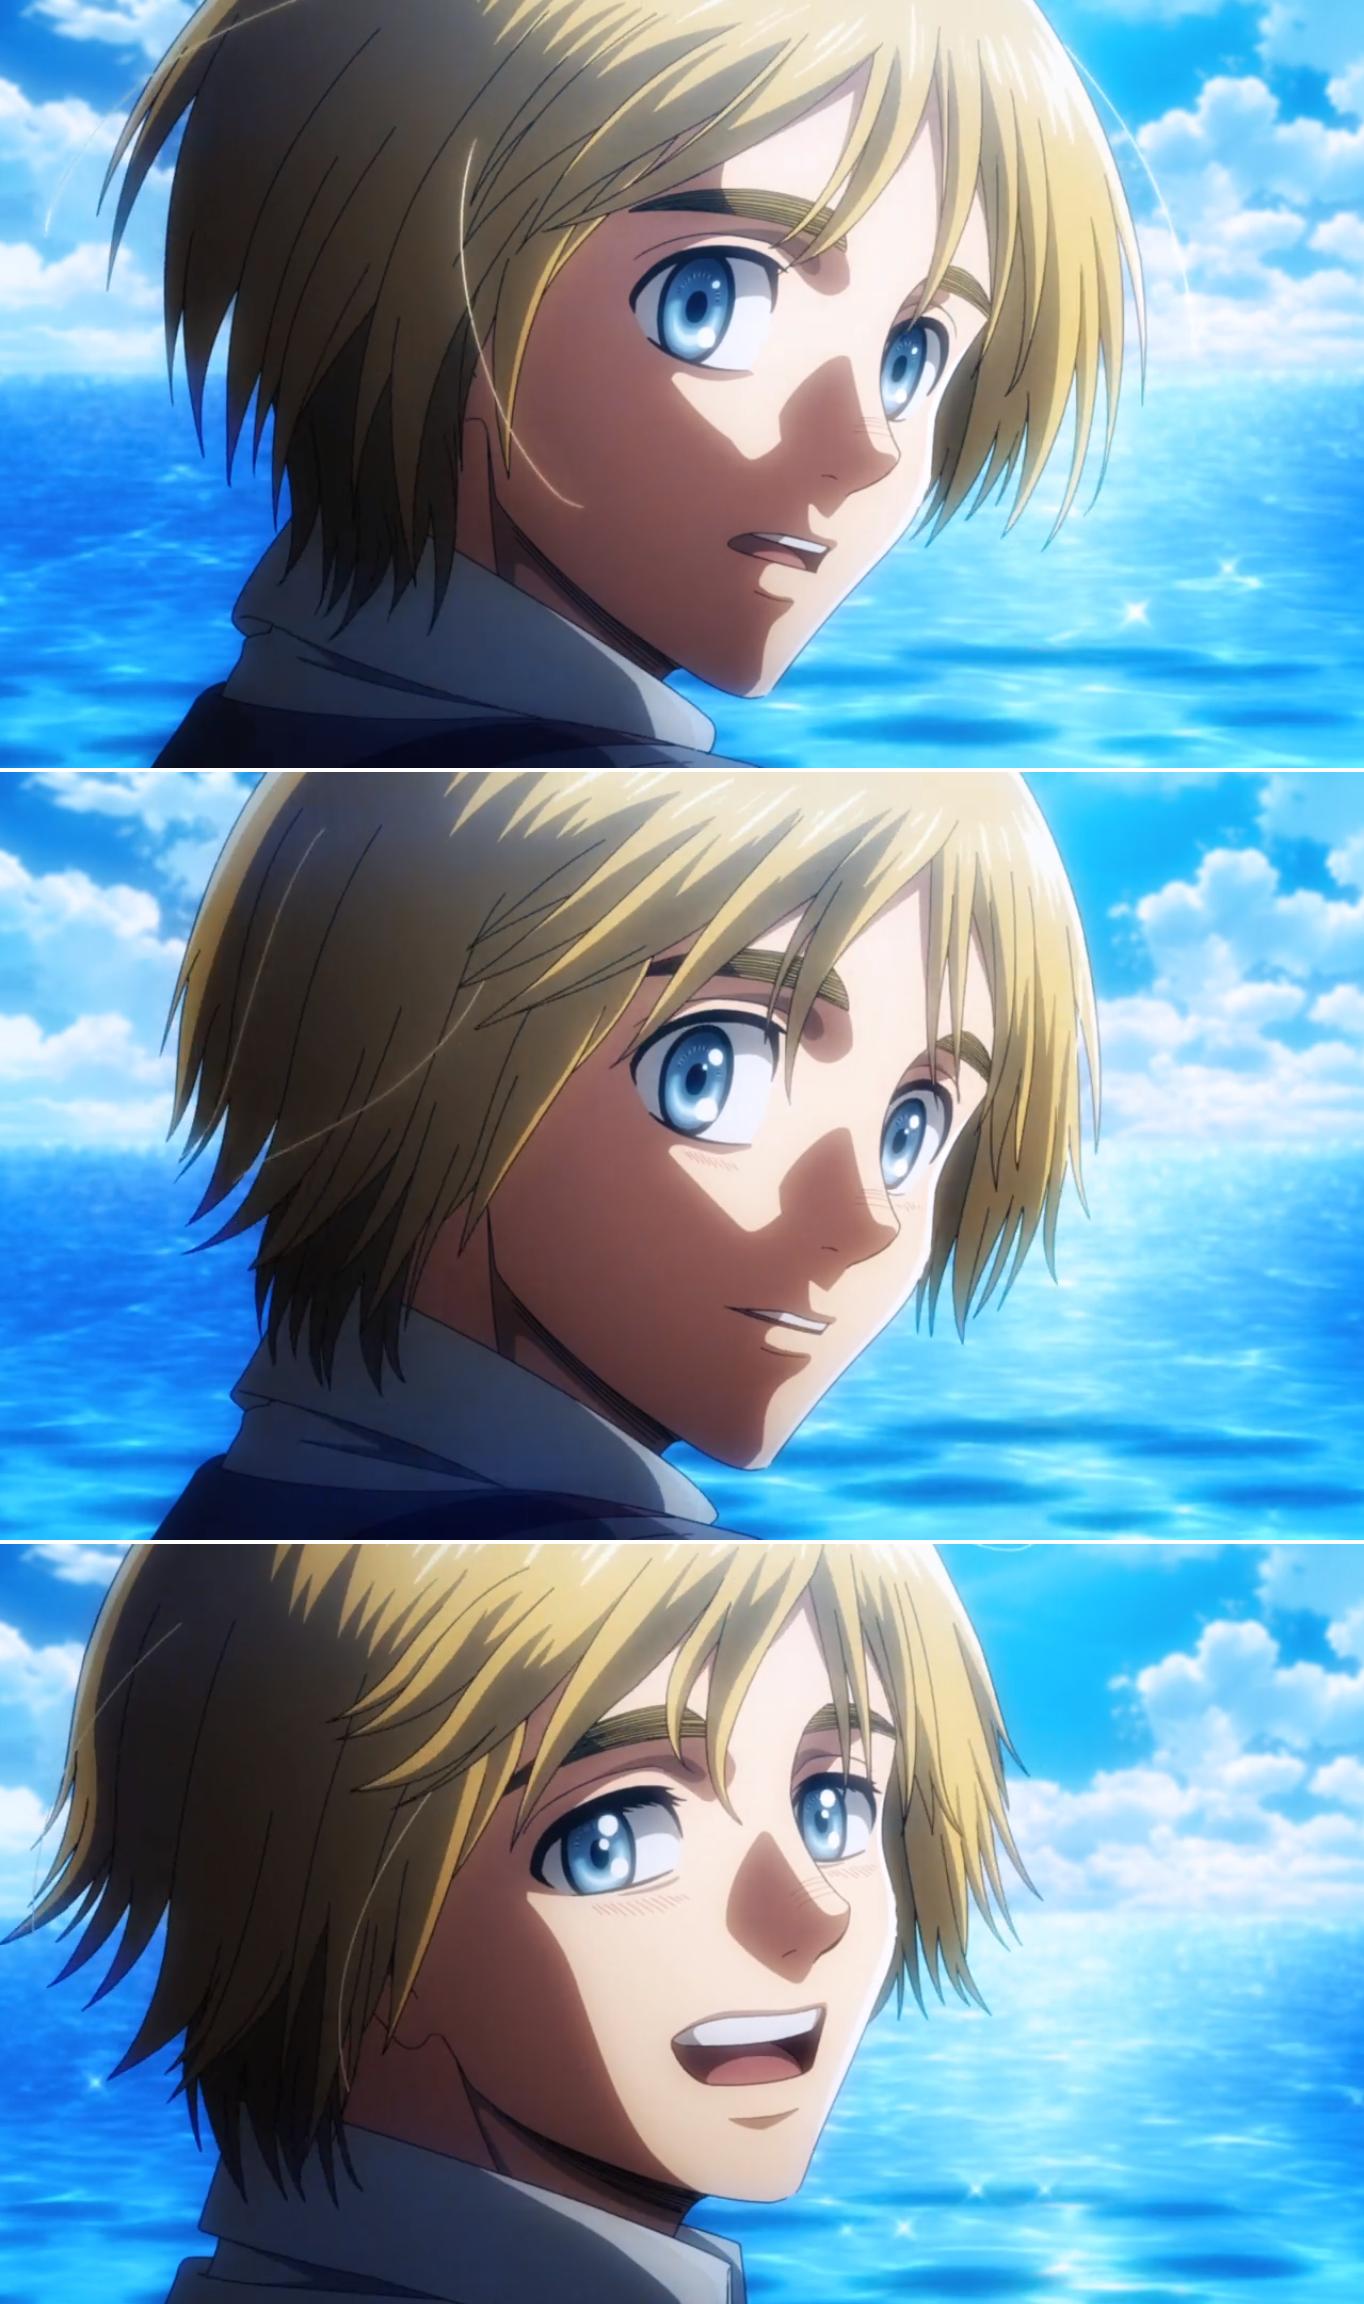 Armin Arlert Attack On Titan Attack On Titan Anime Attack On Titan Armin Snk